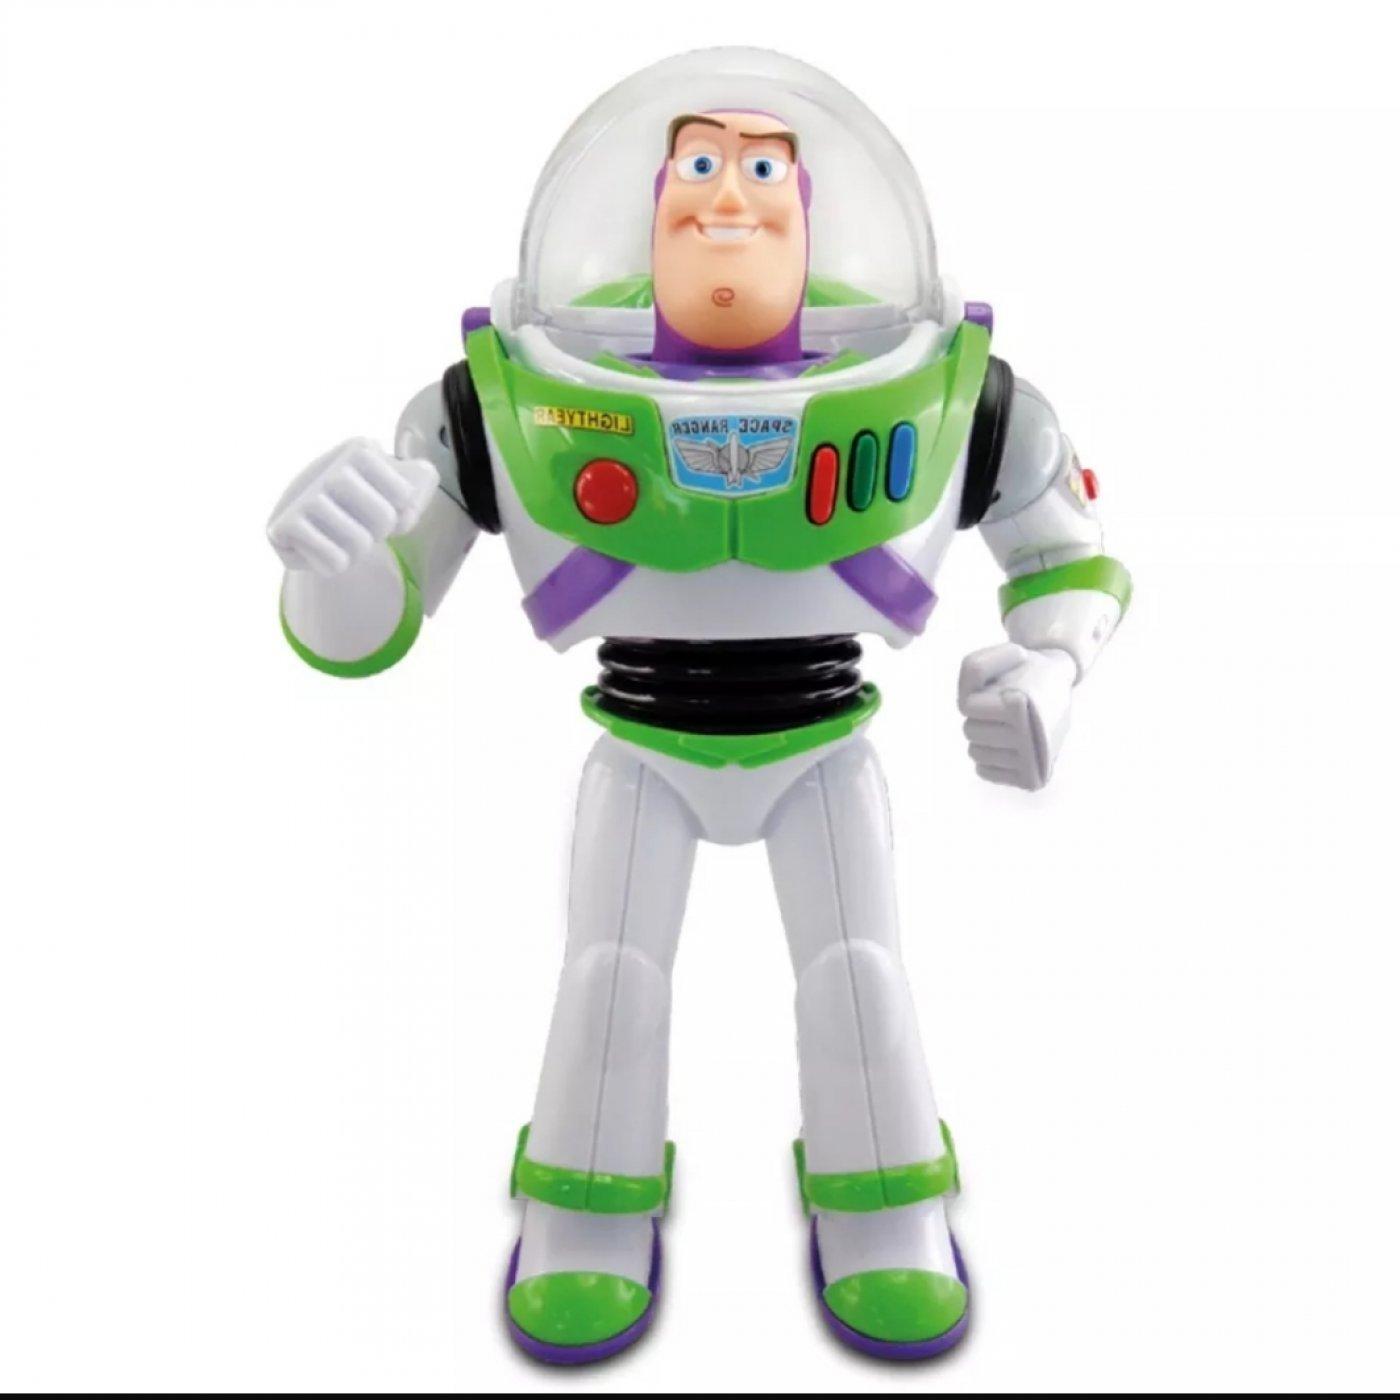 Toy Story 4 Buzz Lightyear Mas De 65 Frases